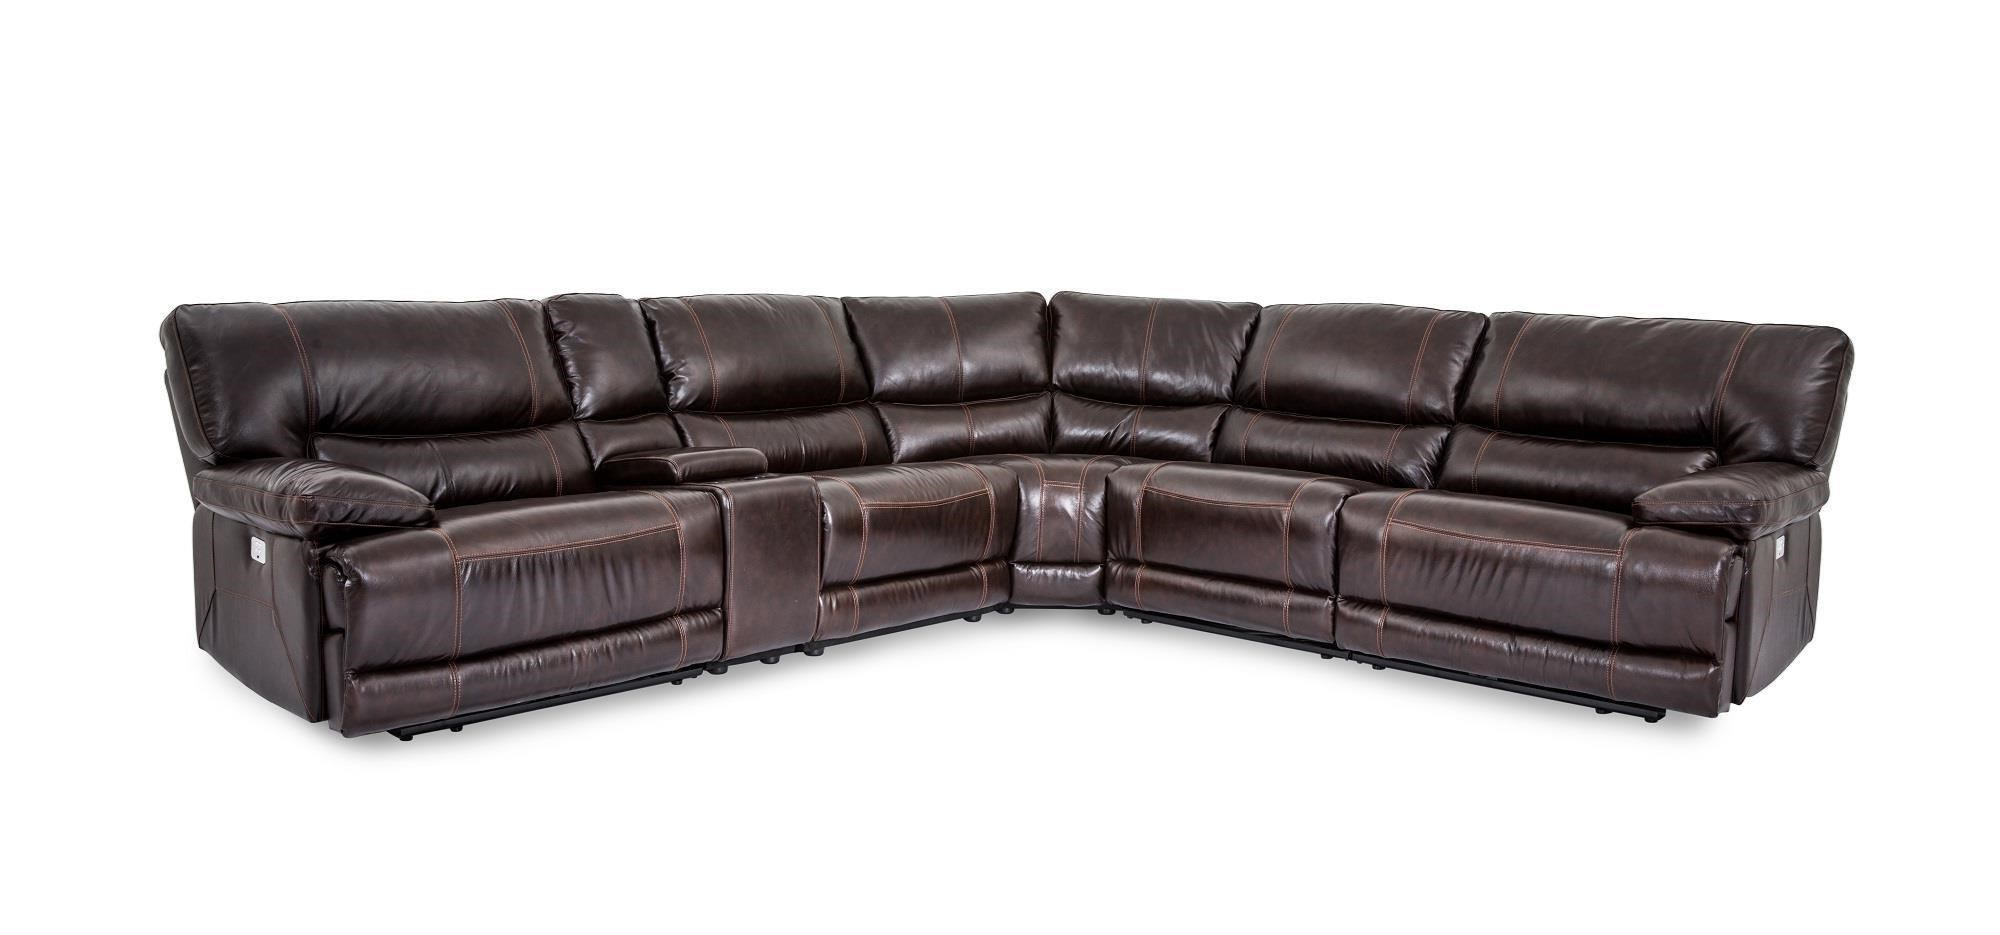 harper fabric 6 piece modular sectional sofa clearance slipcovers carrington